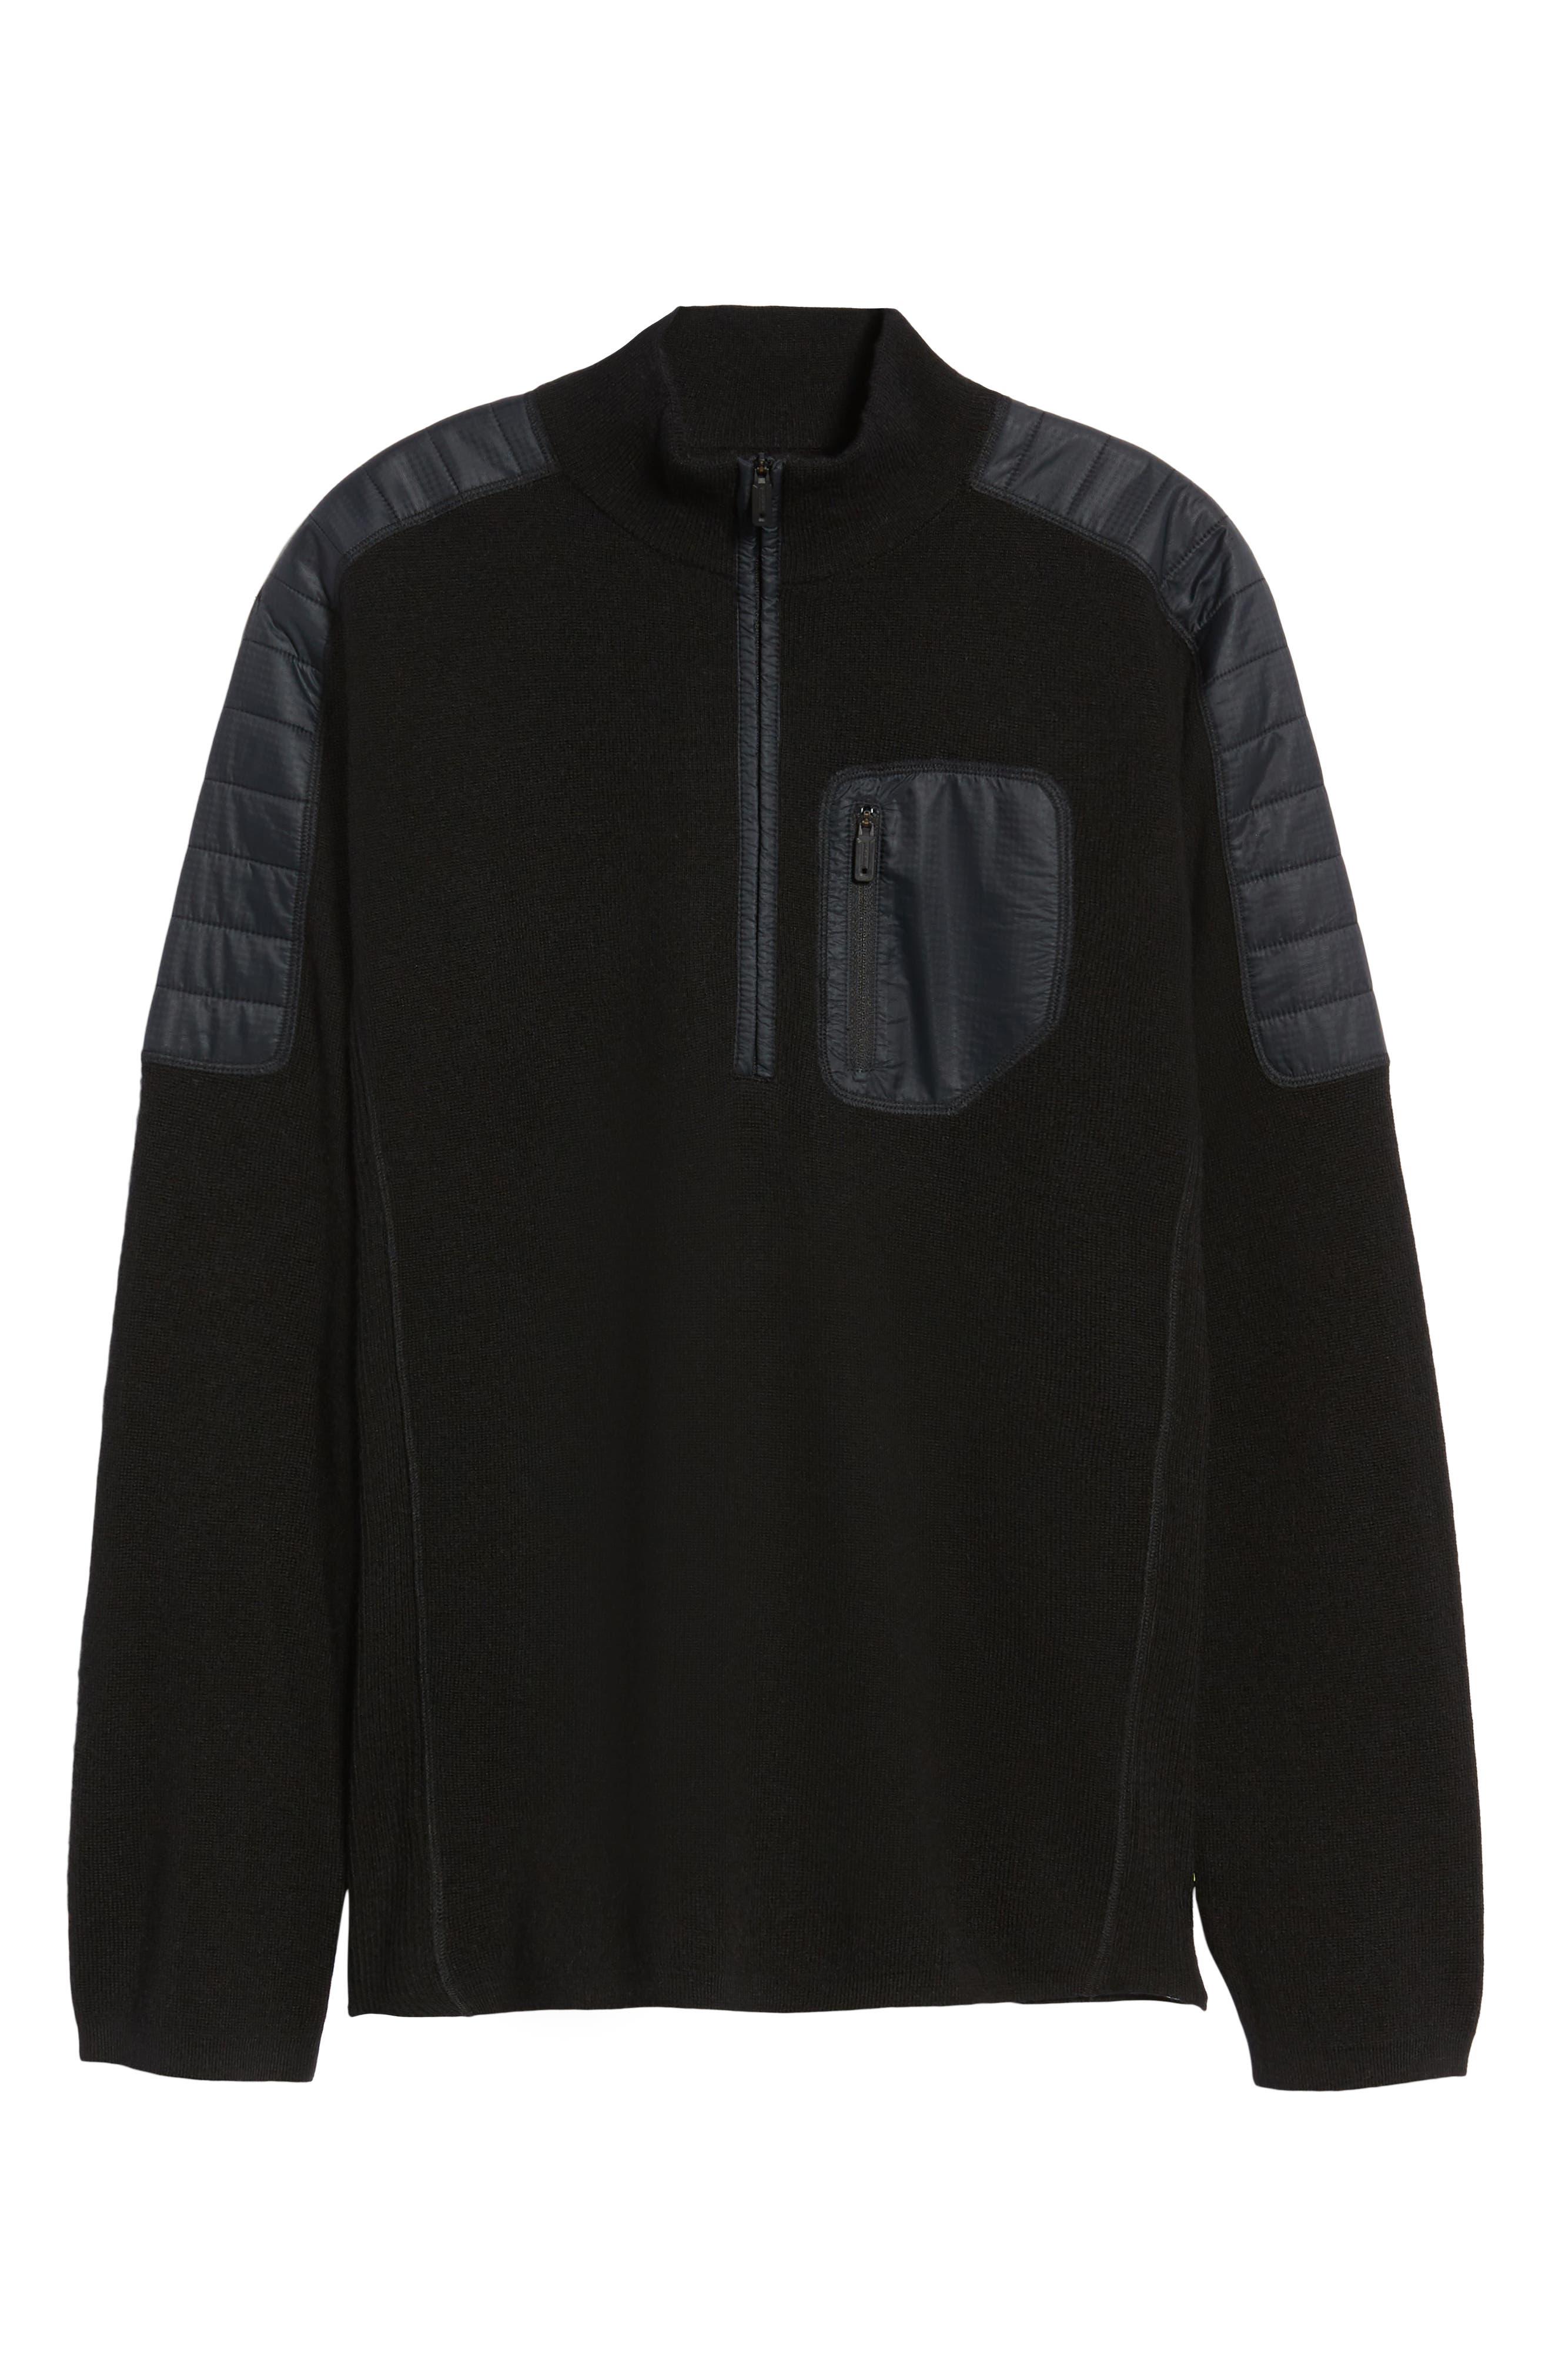 SMARTWOOL,                             Ski Ninja Pullover Sweater,                             Alternate thumbnail 6, color,                             BLACK